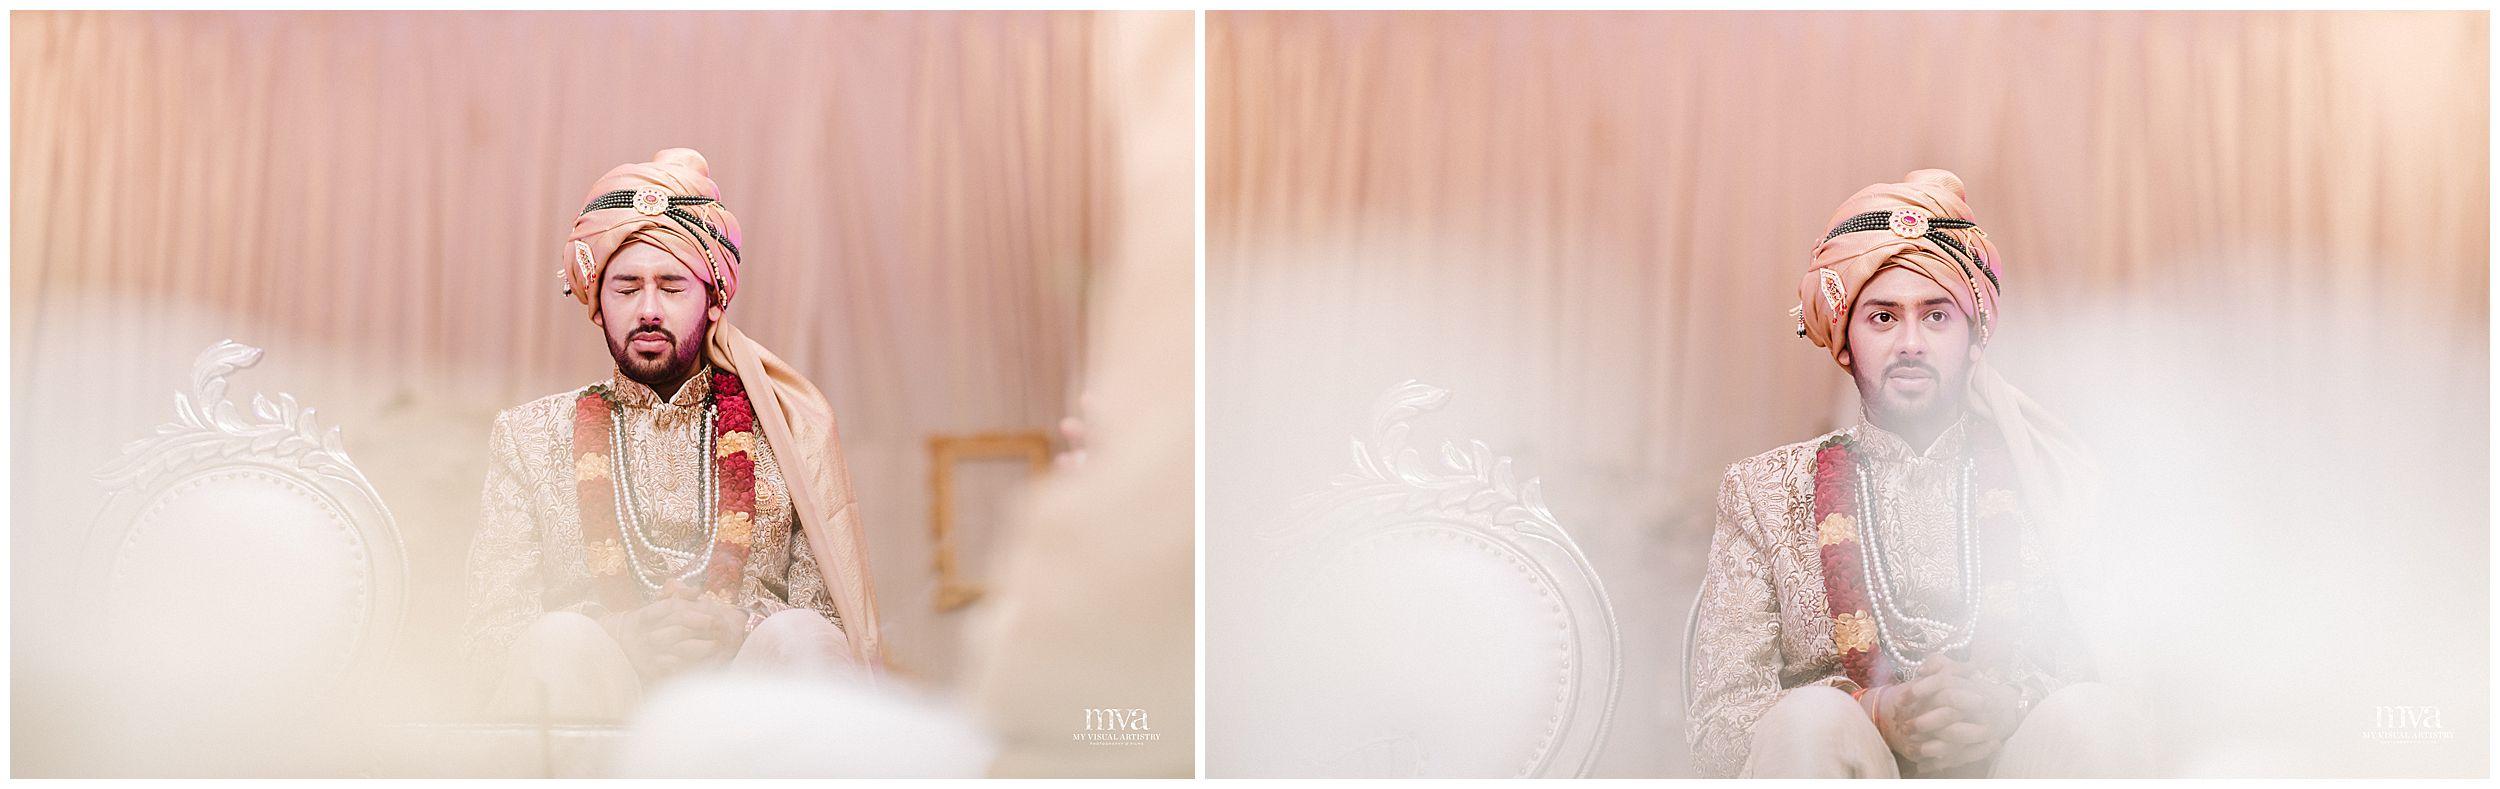 SONAAL_AMI_MYVISUALARTISTRY_WEDDING_PHOTOGRAPHY_MVA_NEPAL_KATHMANDU_SOALTEE56.jpg